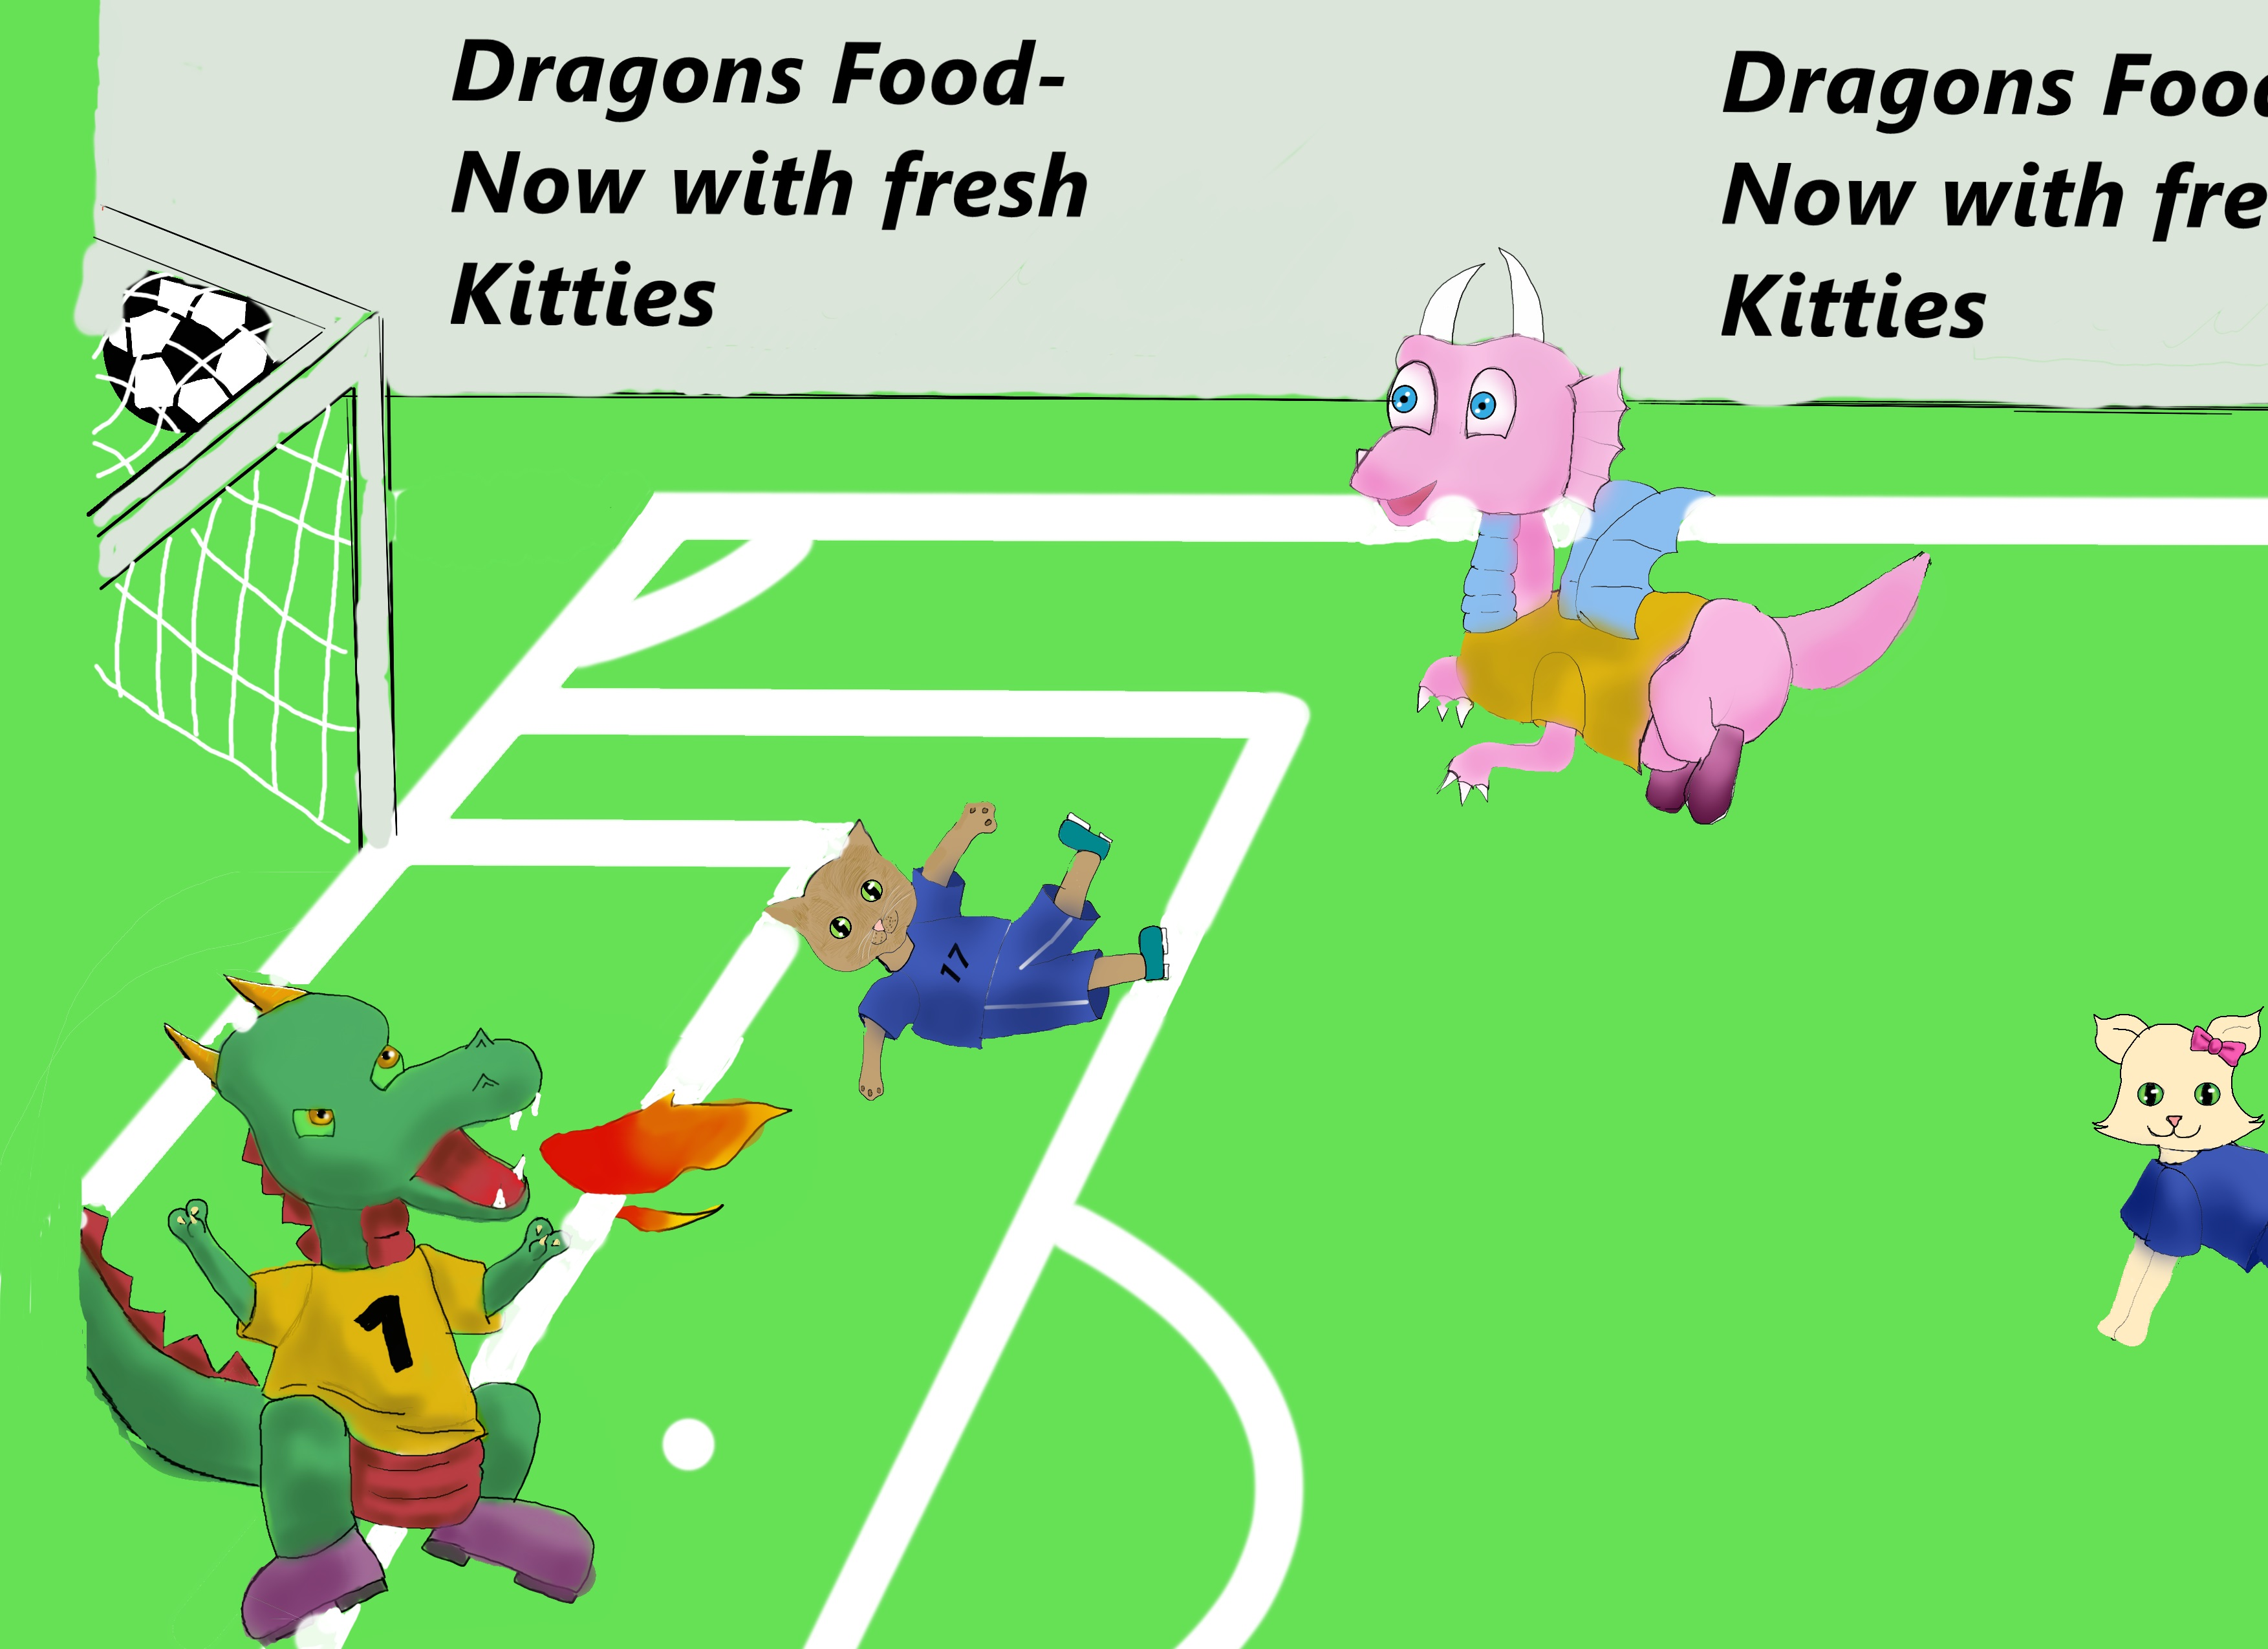 DragonsVsKittens